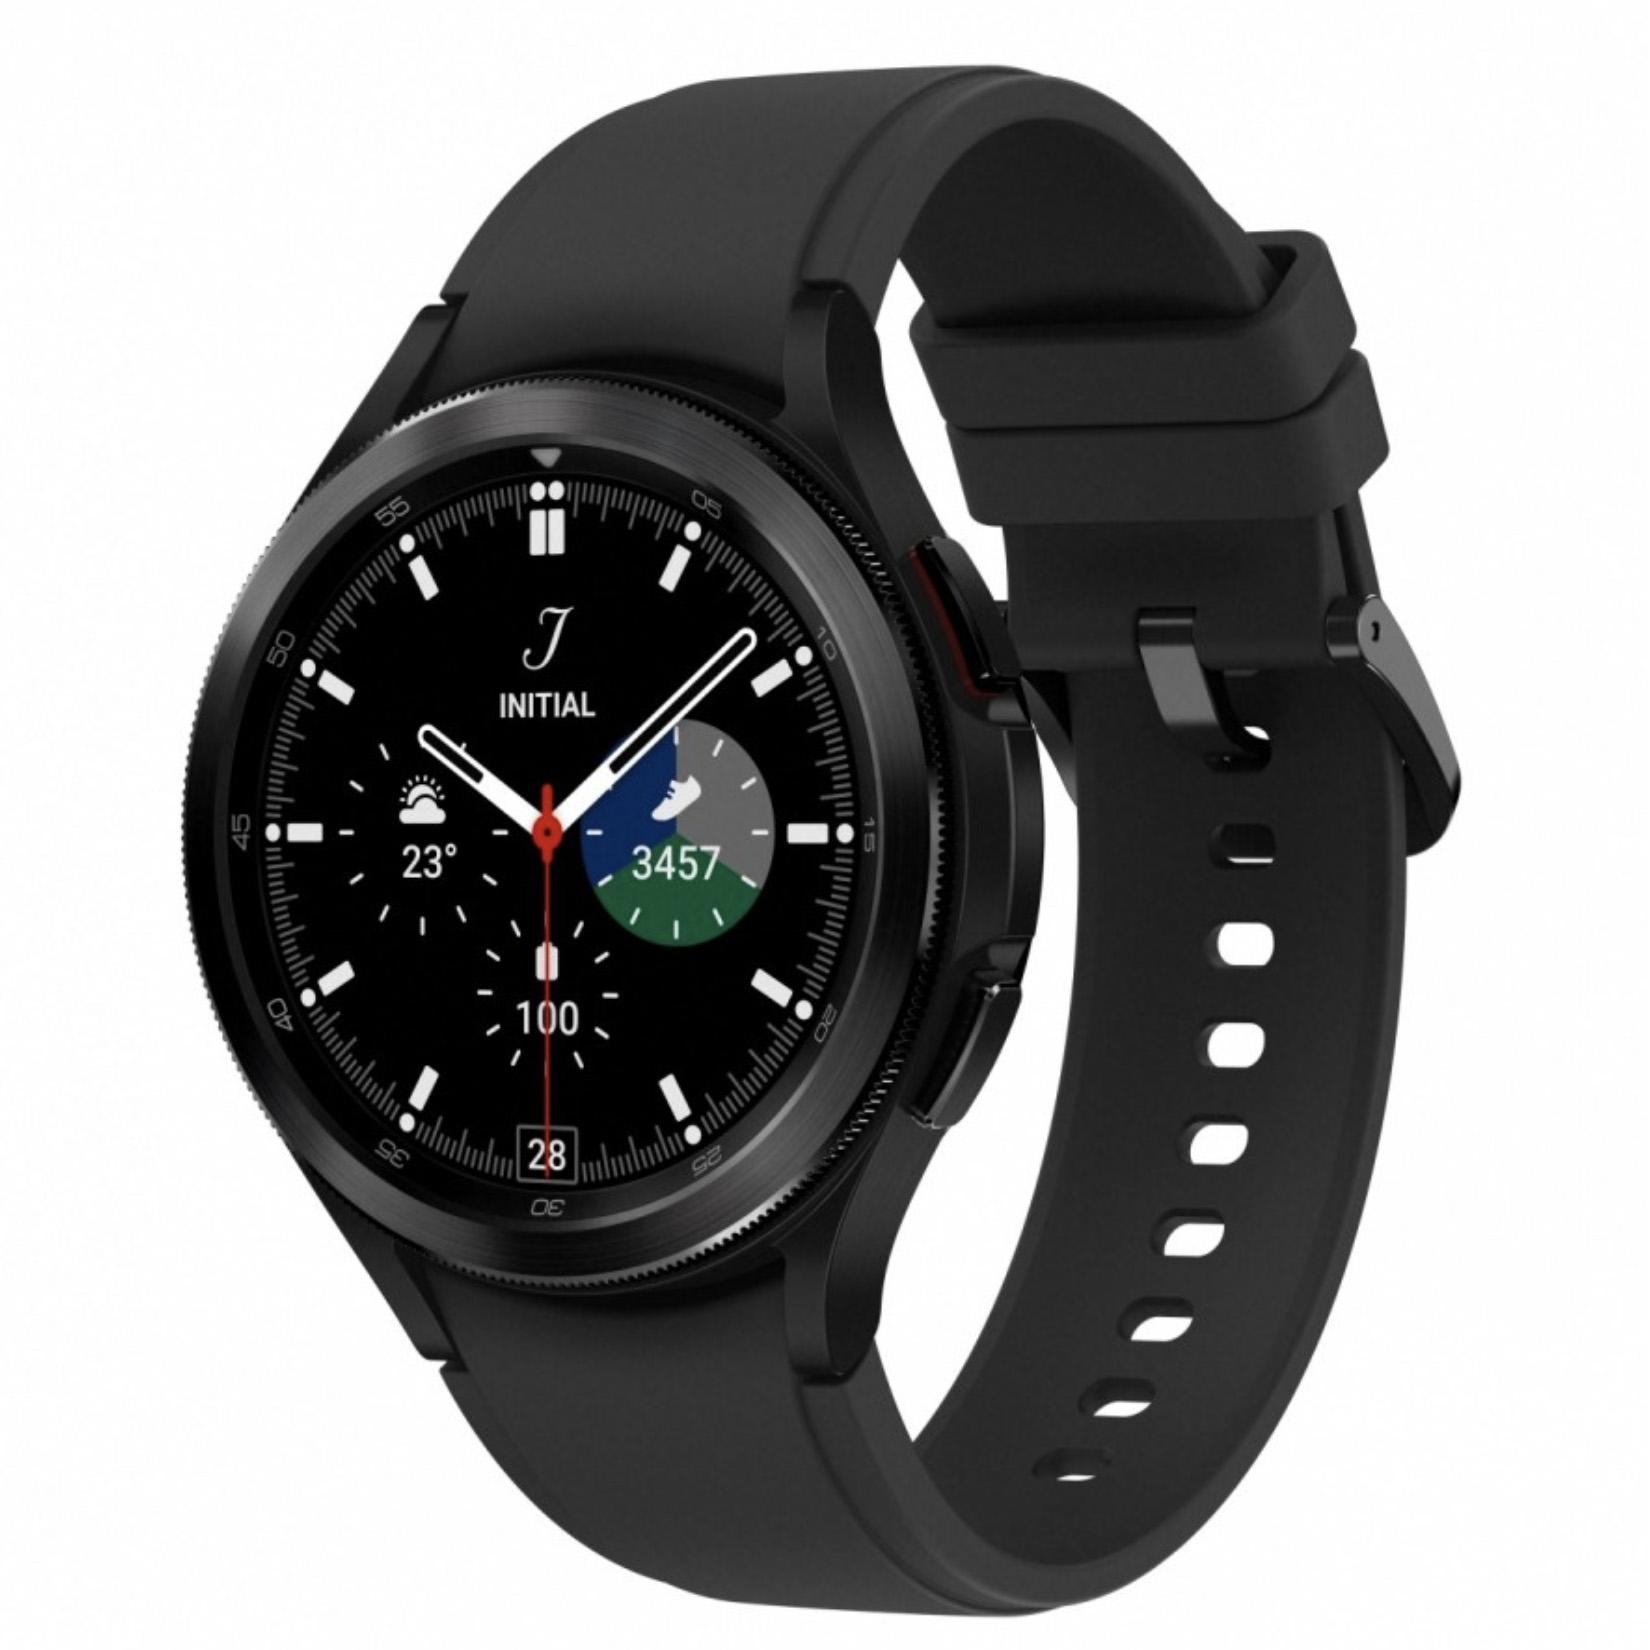 فروش نقدی و اقساطی ساعت هوشمند سامسونگ مدل Galaxy Watch4 Classic 42mm